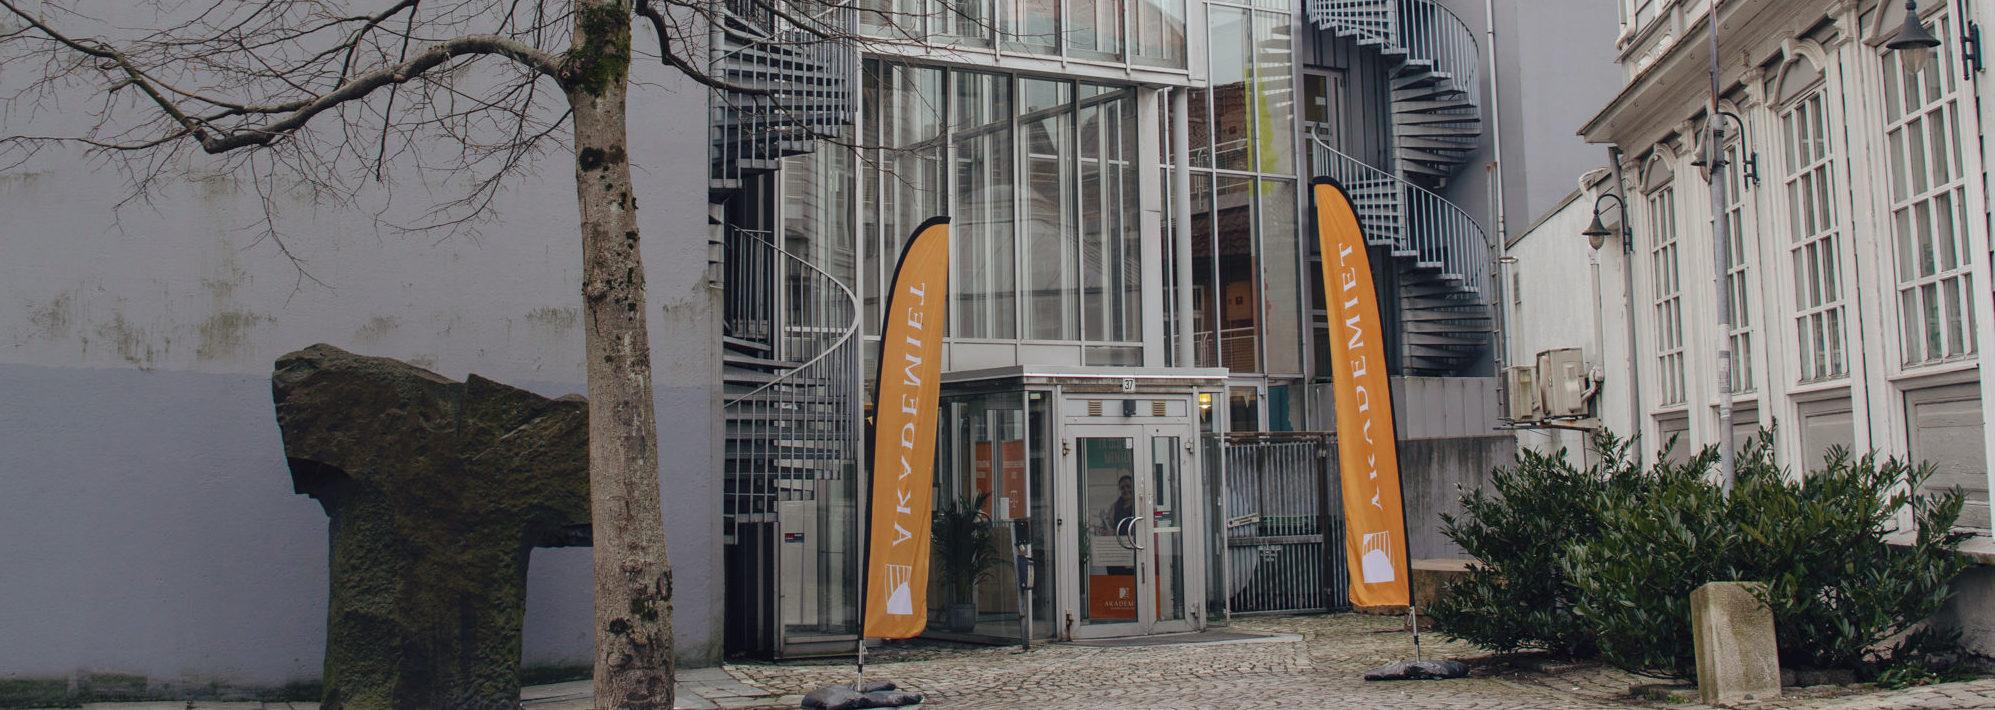 Akademiet Privatistskole Bergen